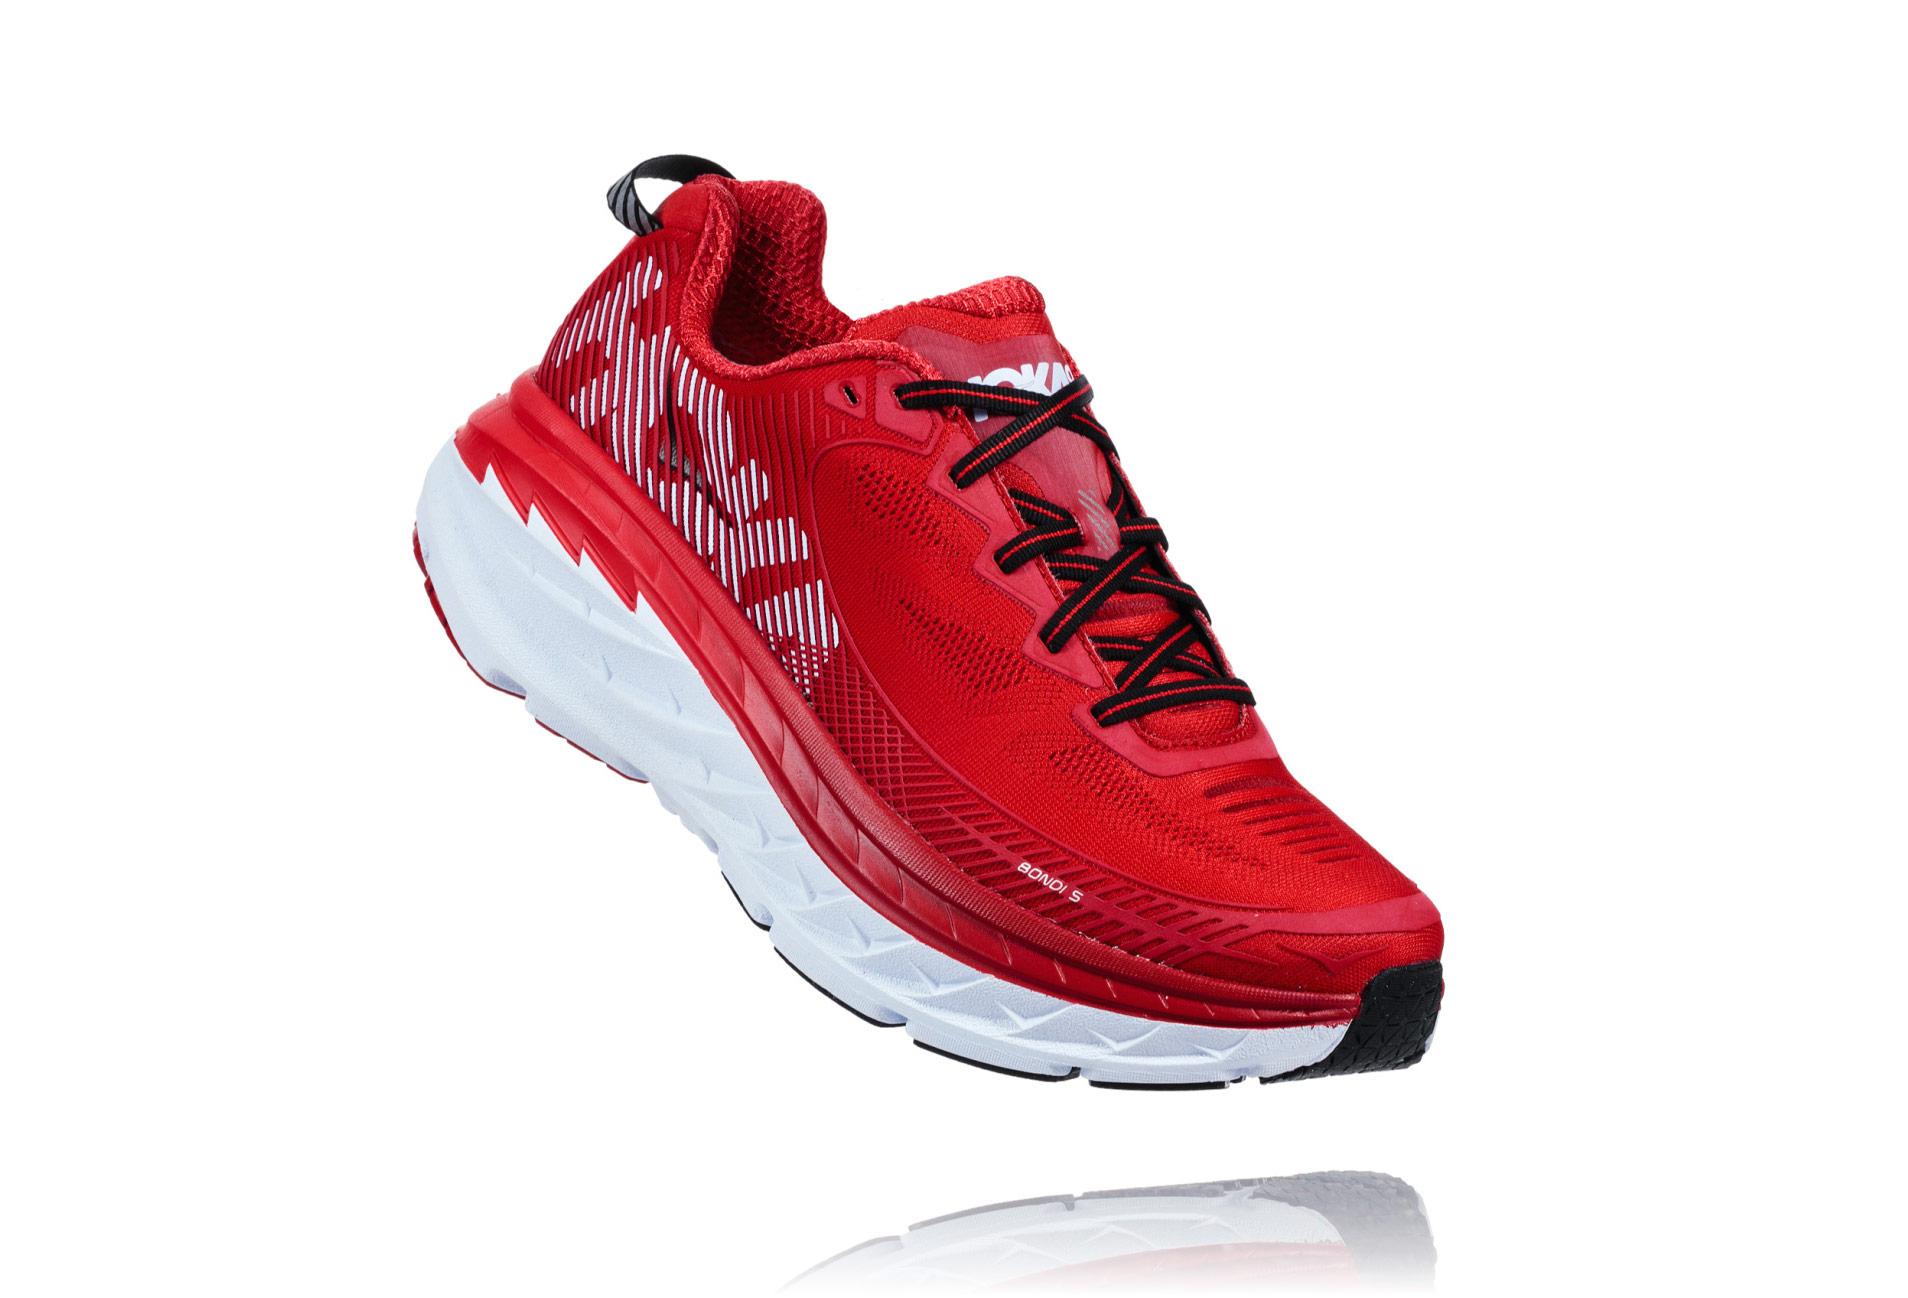 HOKA BONDI 5 Chaussures - Homme - Rouge - 44 2/3 vlXttM2Z